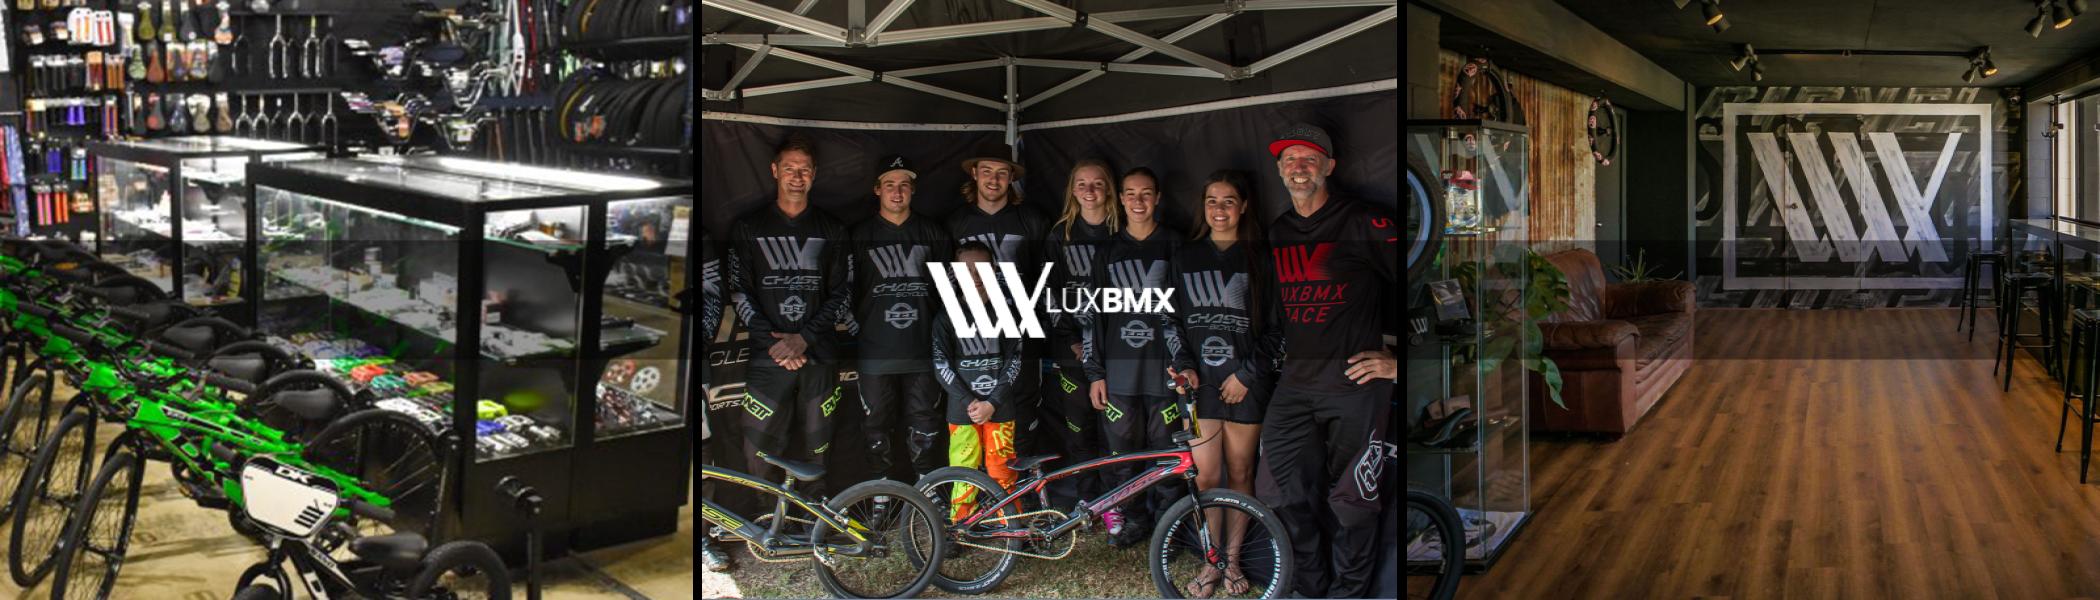 LUX BMX